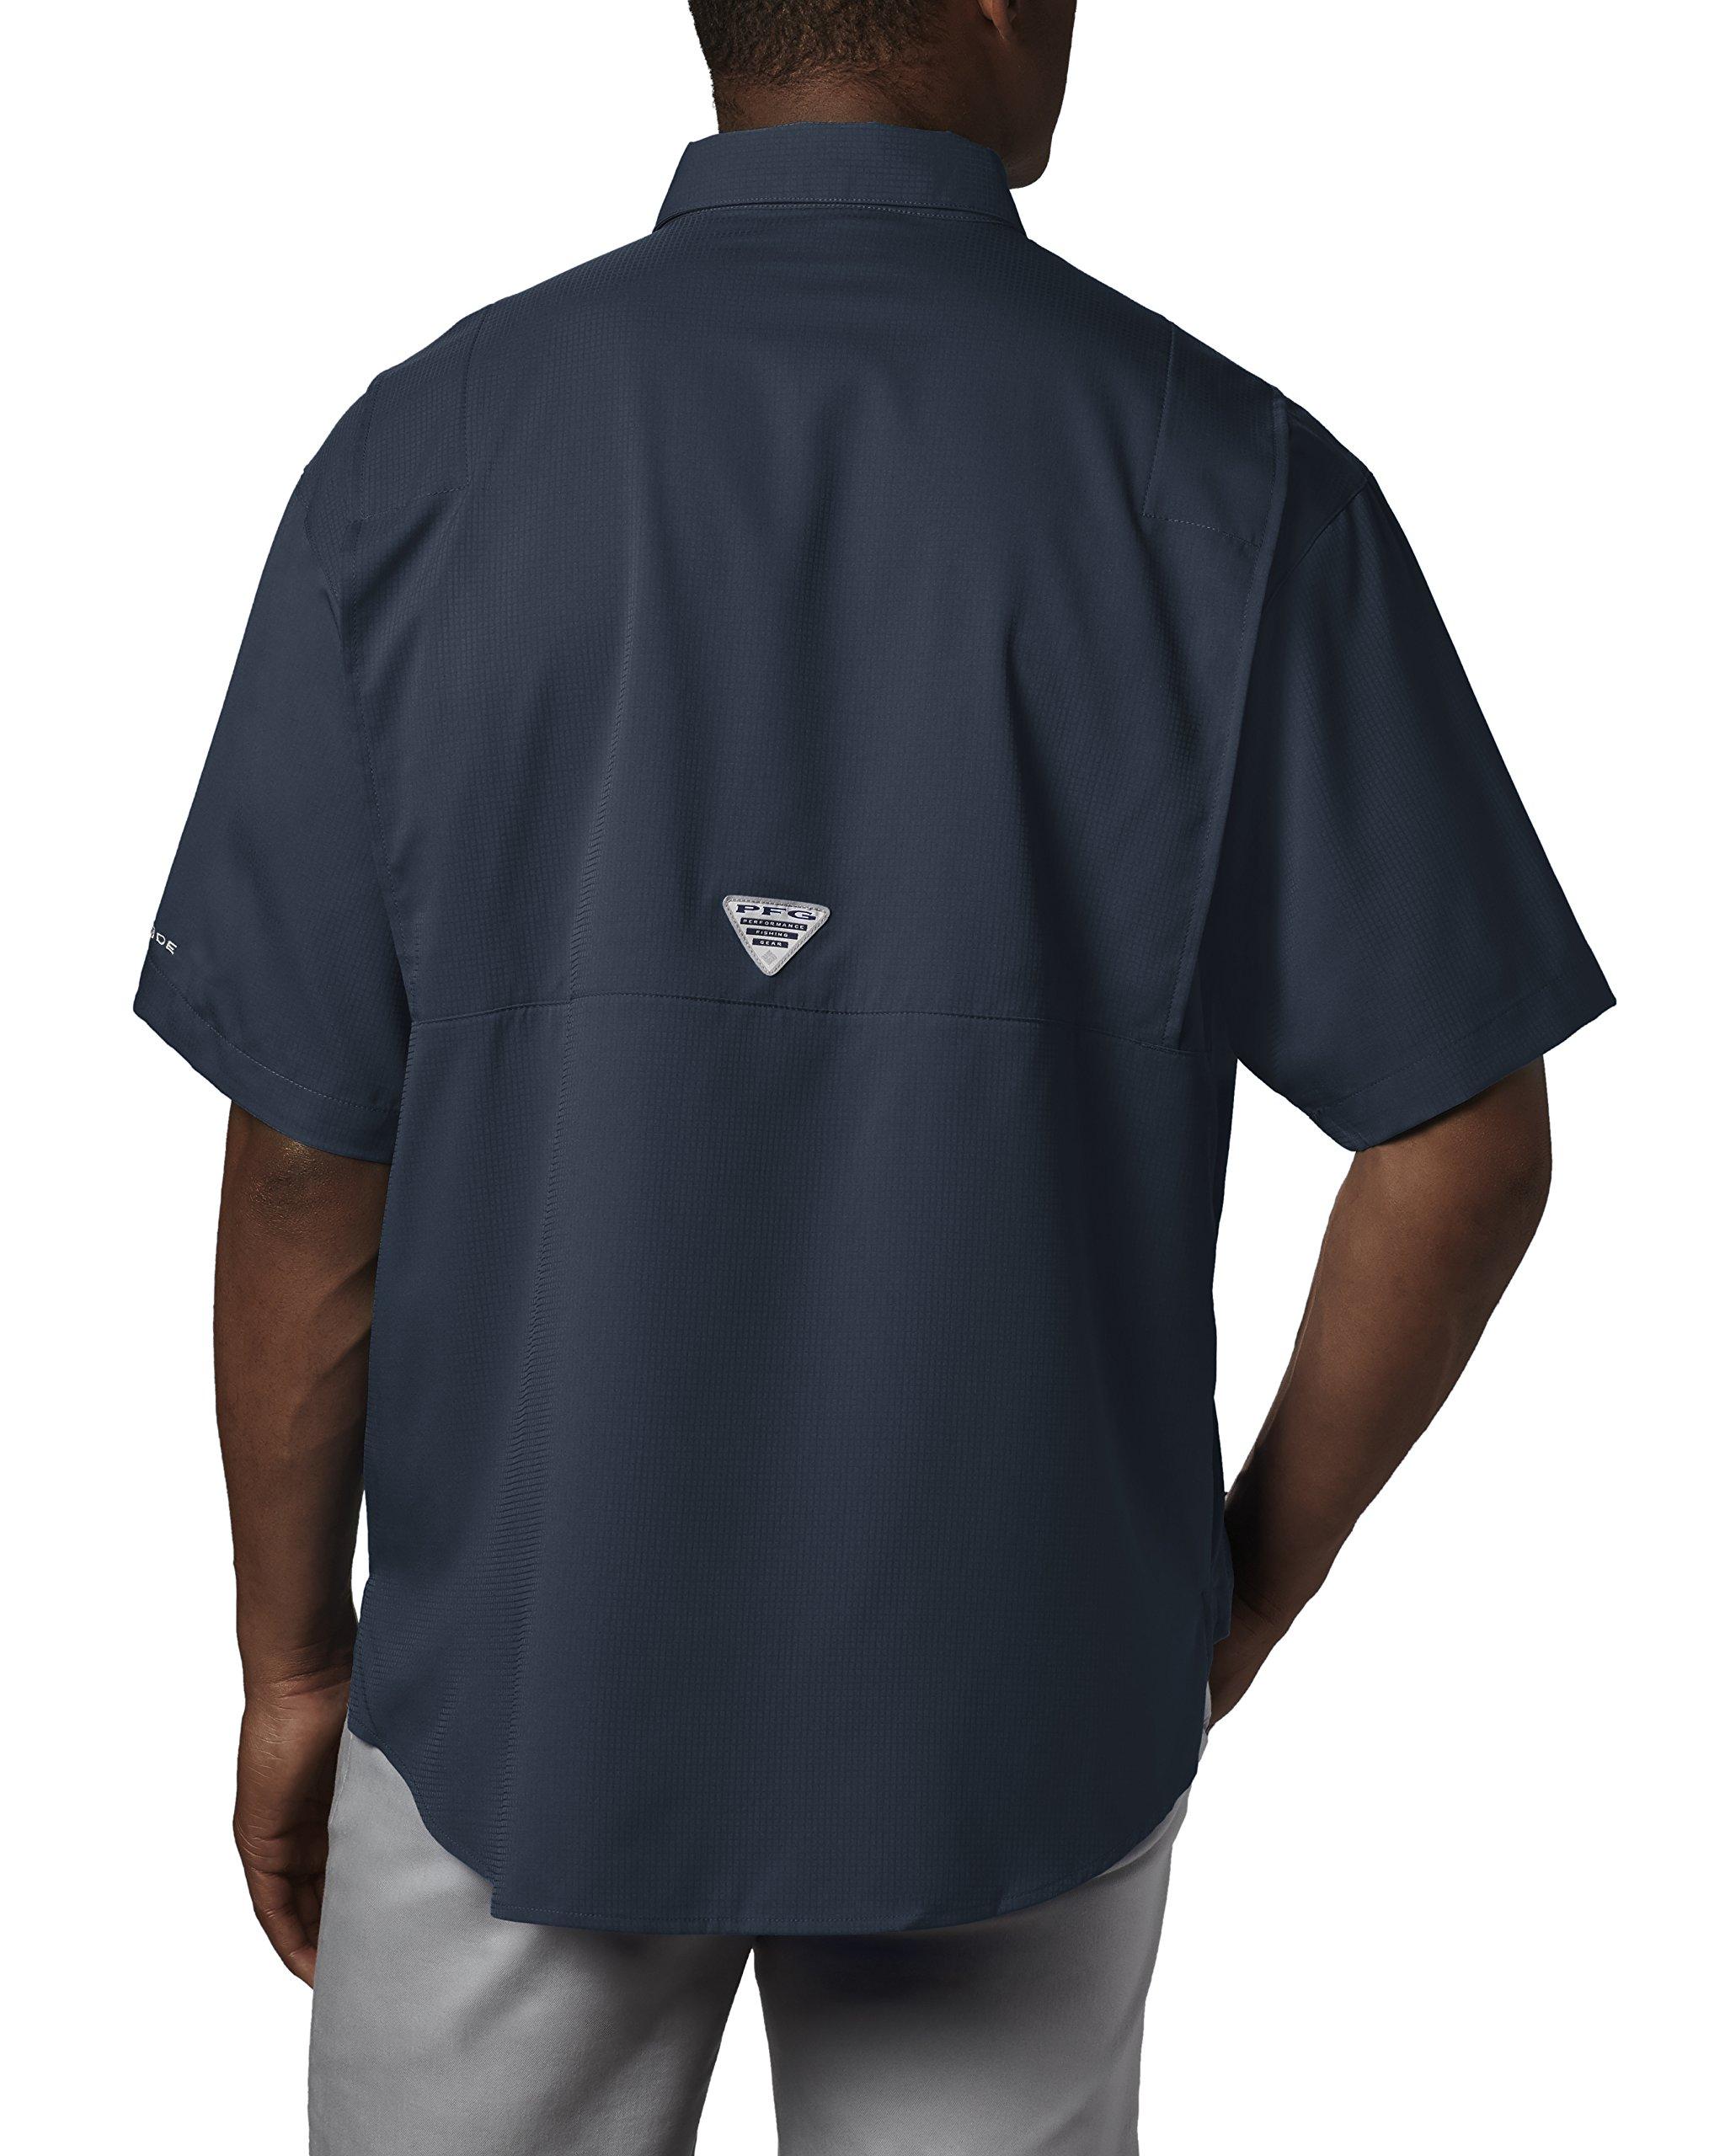 Columbia Men's Tamiami II Short Sleeve Fishing Shirt, Collegiate Navy, X-Small by Columbia (Image #2)